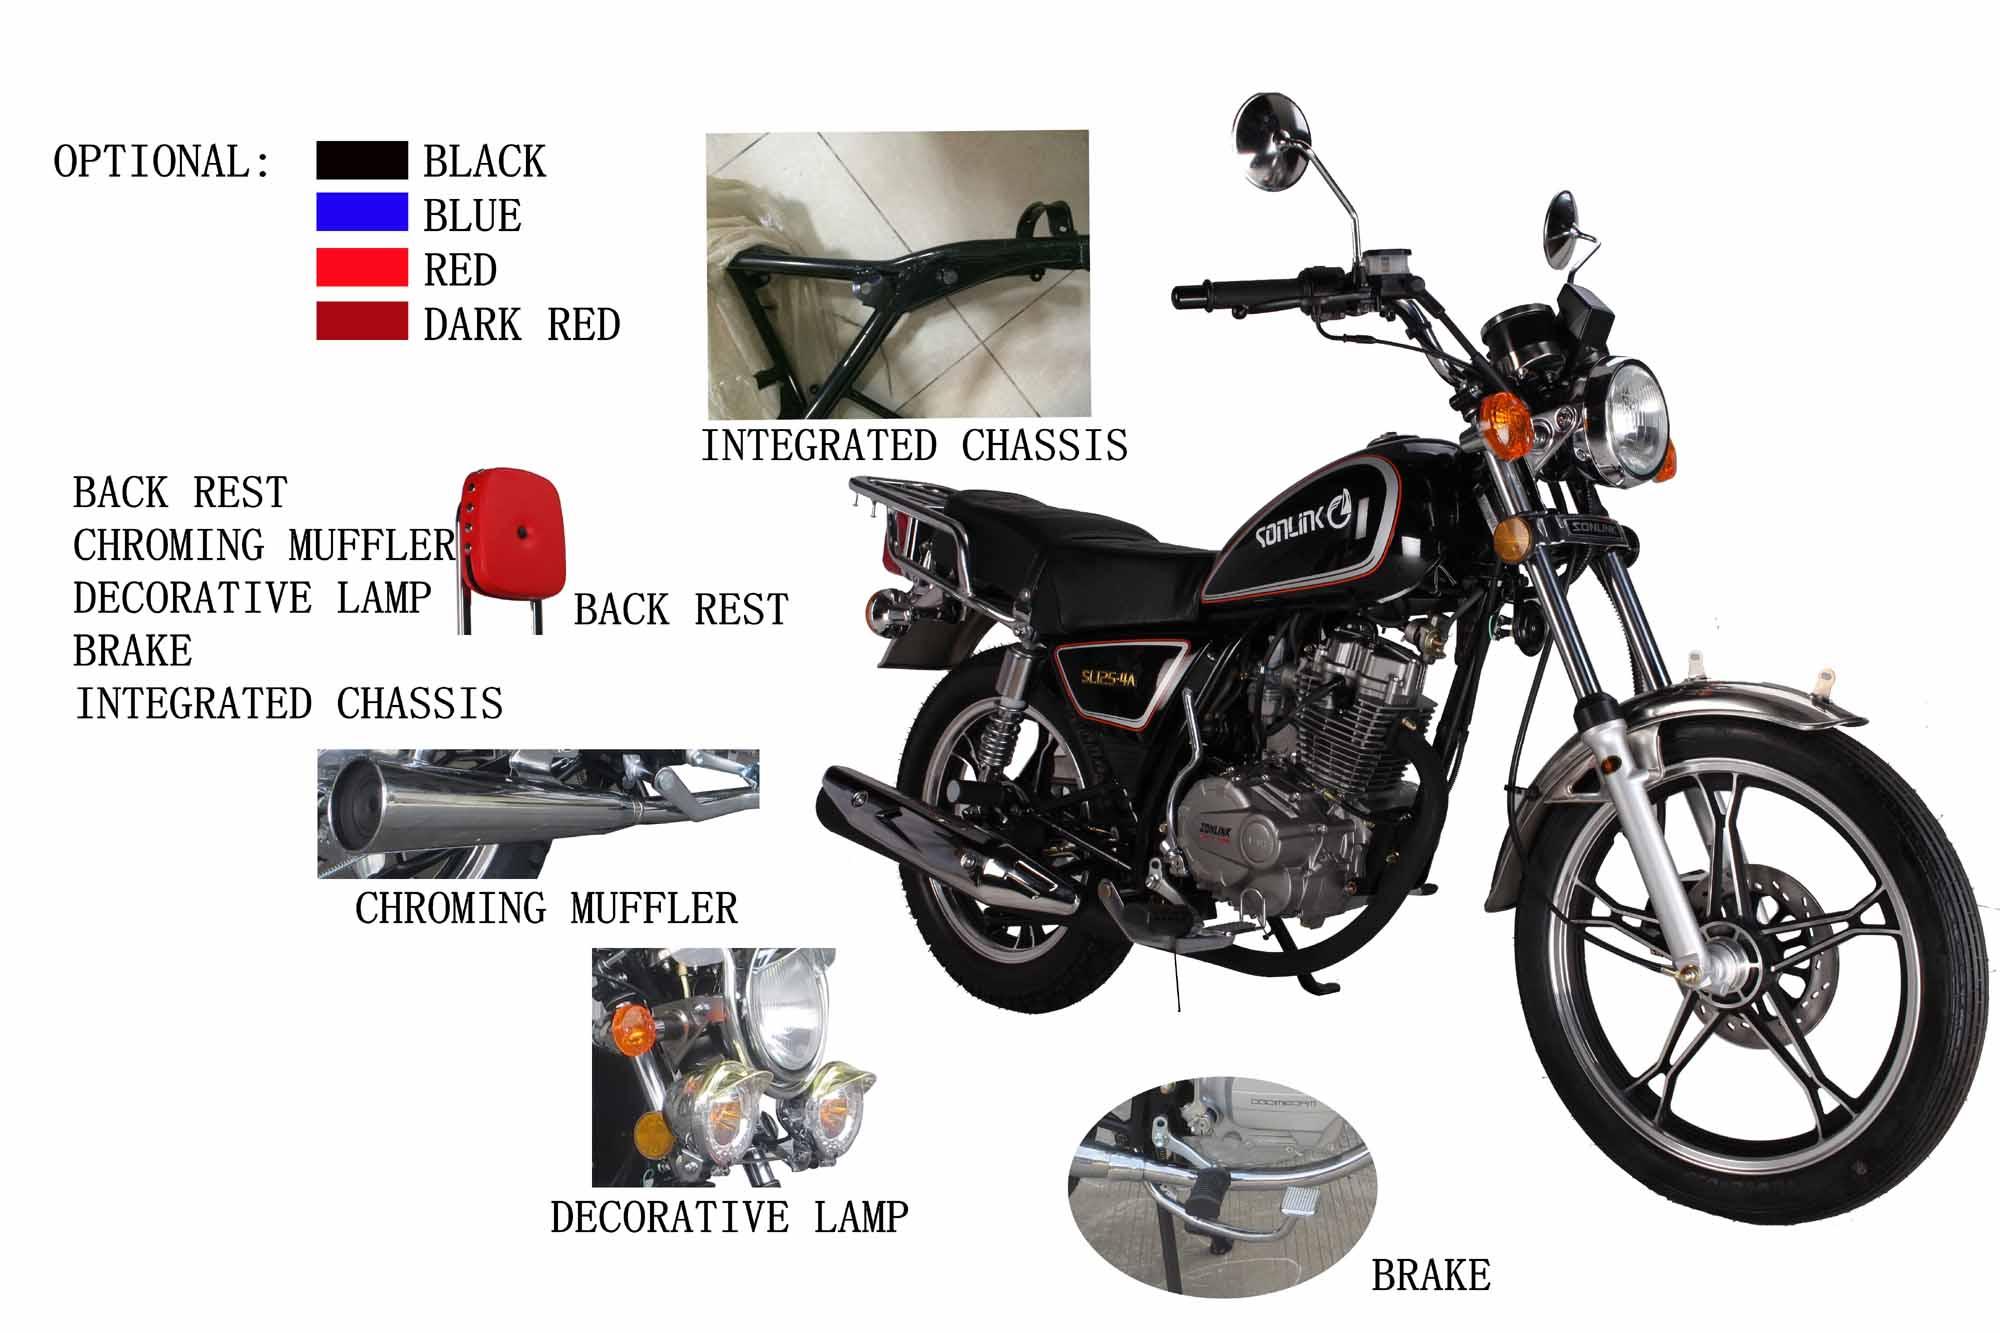 SL150-M1 Motorcycle Optional